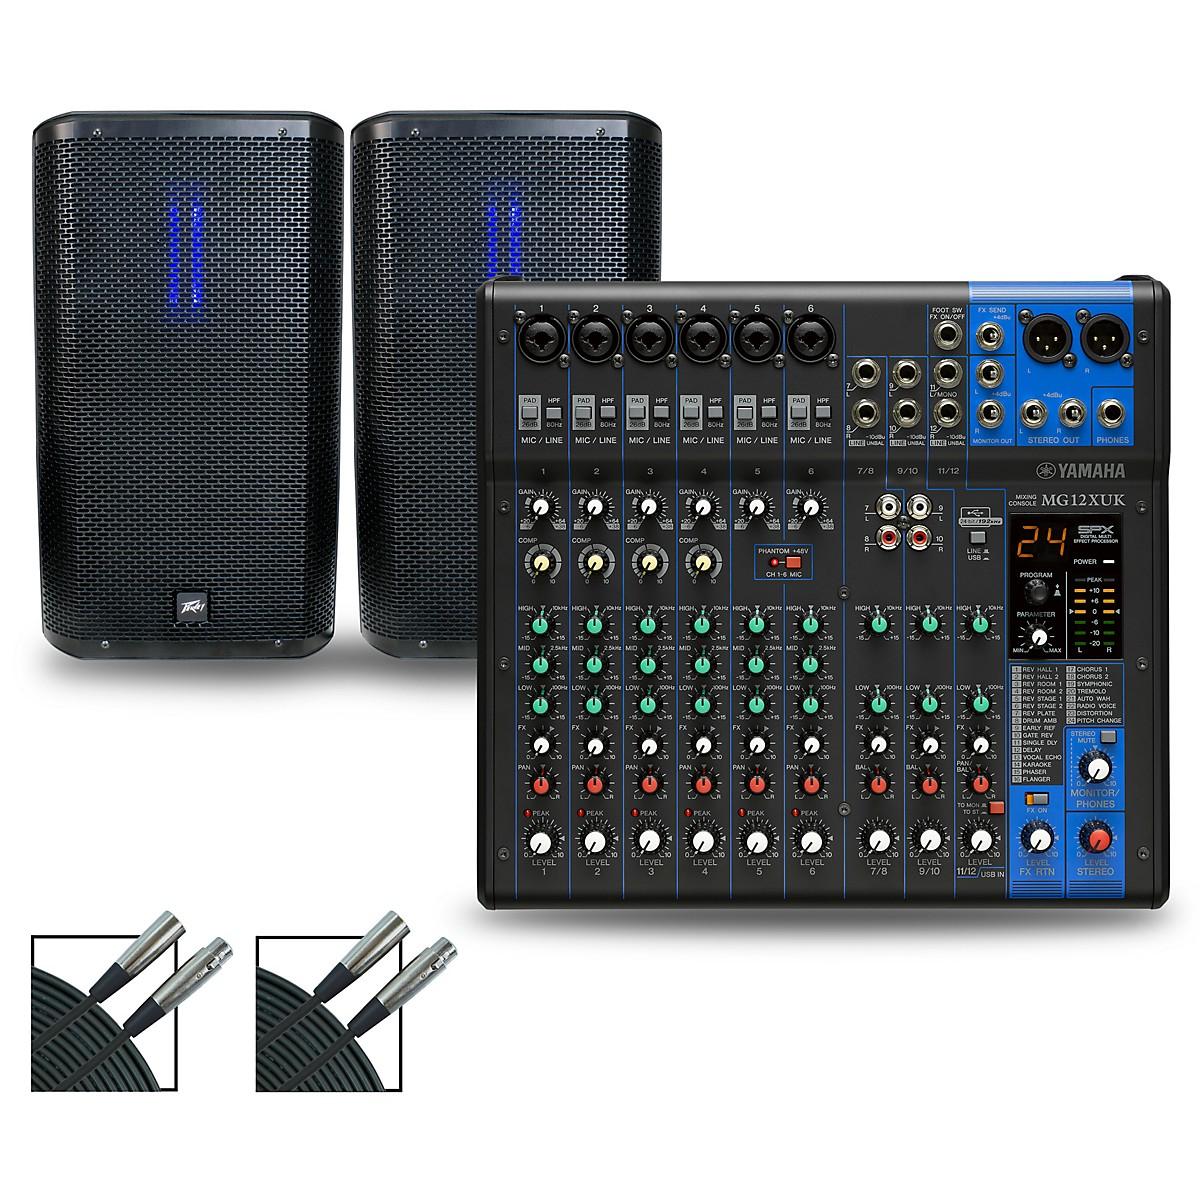 Yamaha MG12XUK Mixer with Peavey RBN Speakers